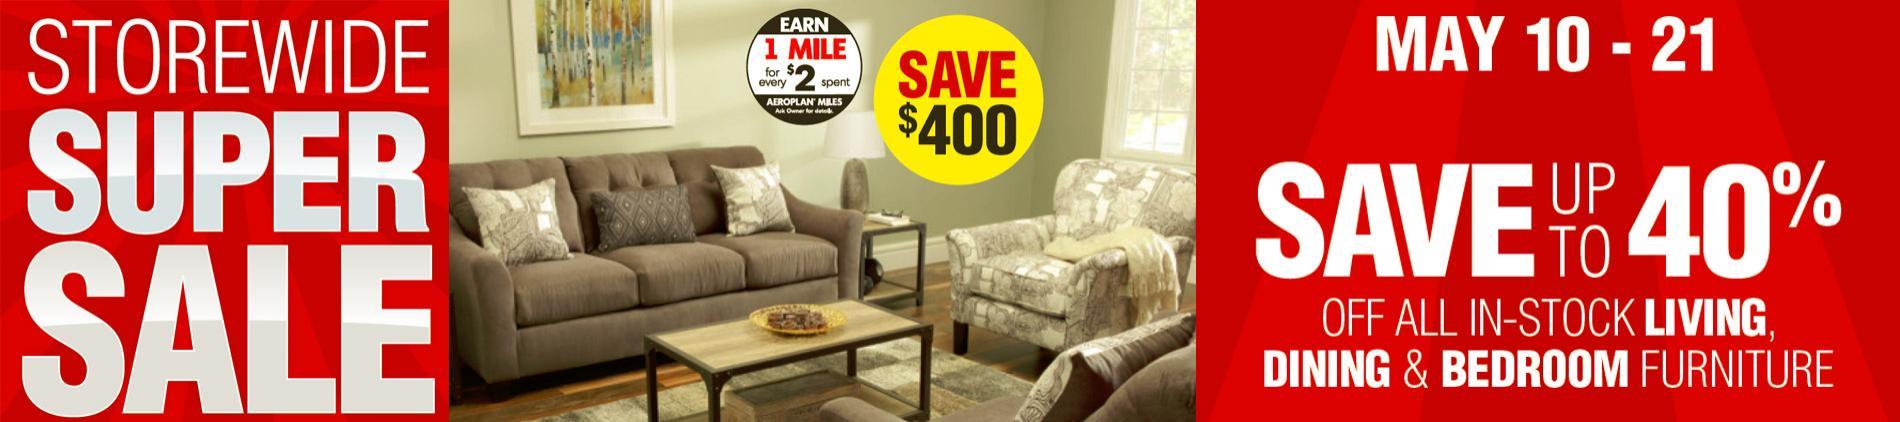 super sale,promotion,storewide,furniture,discounts